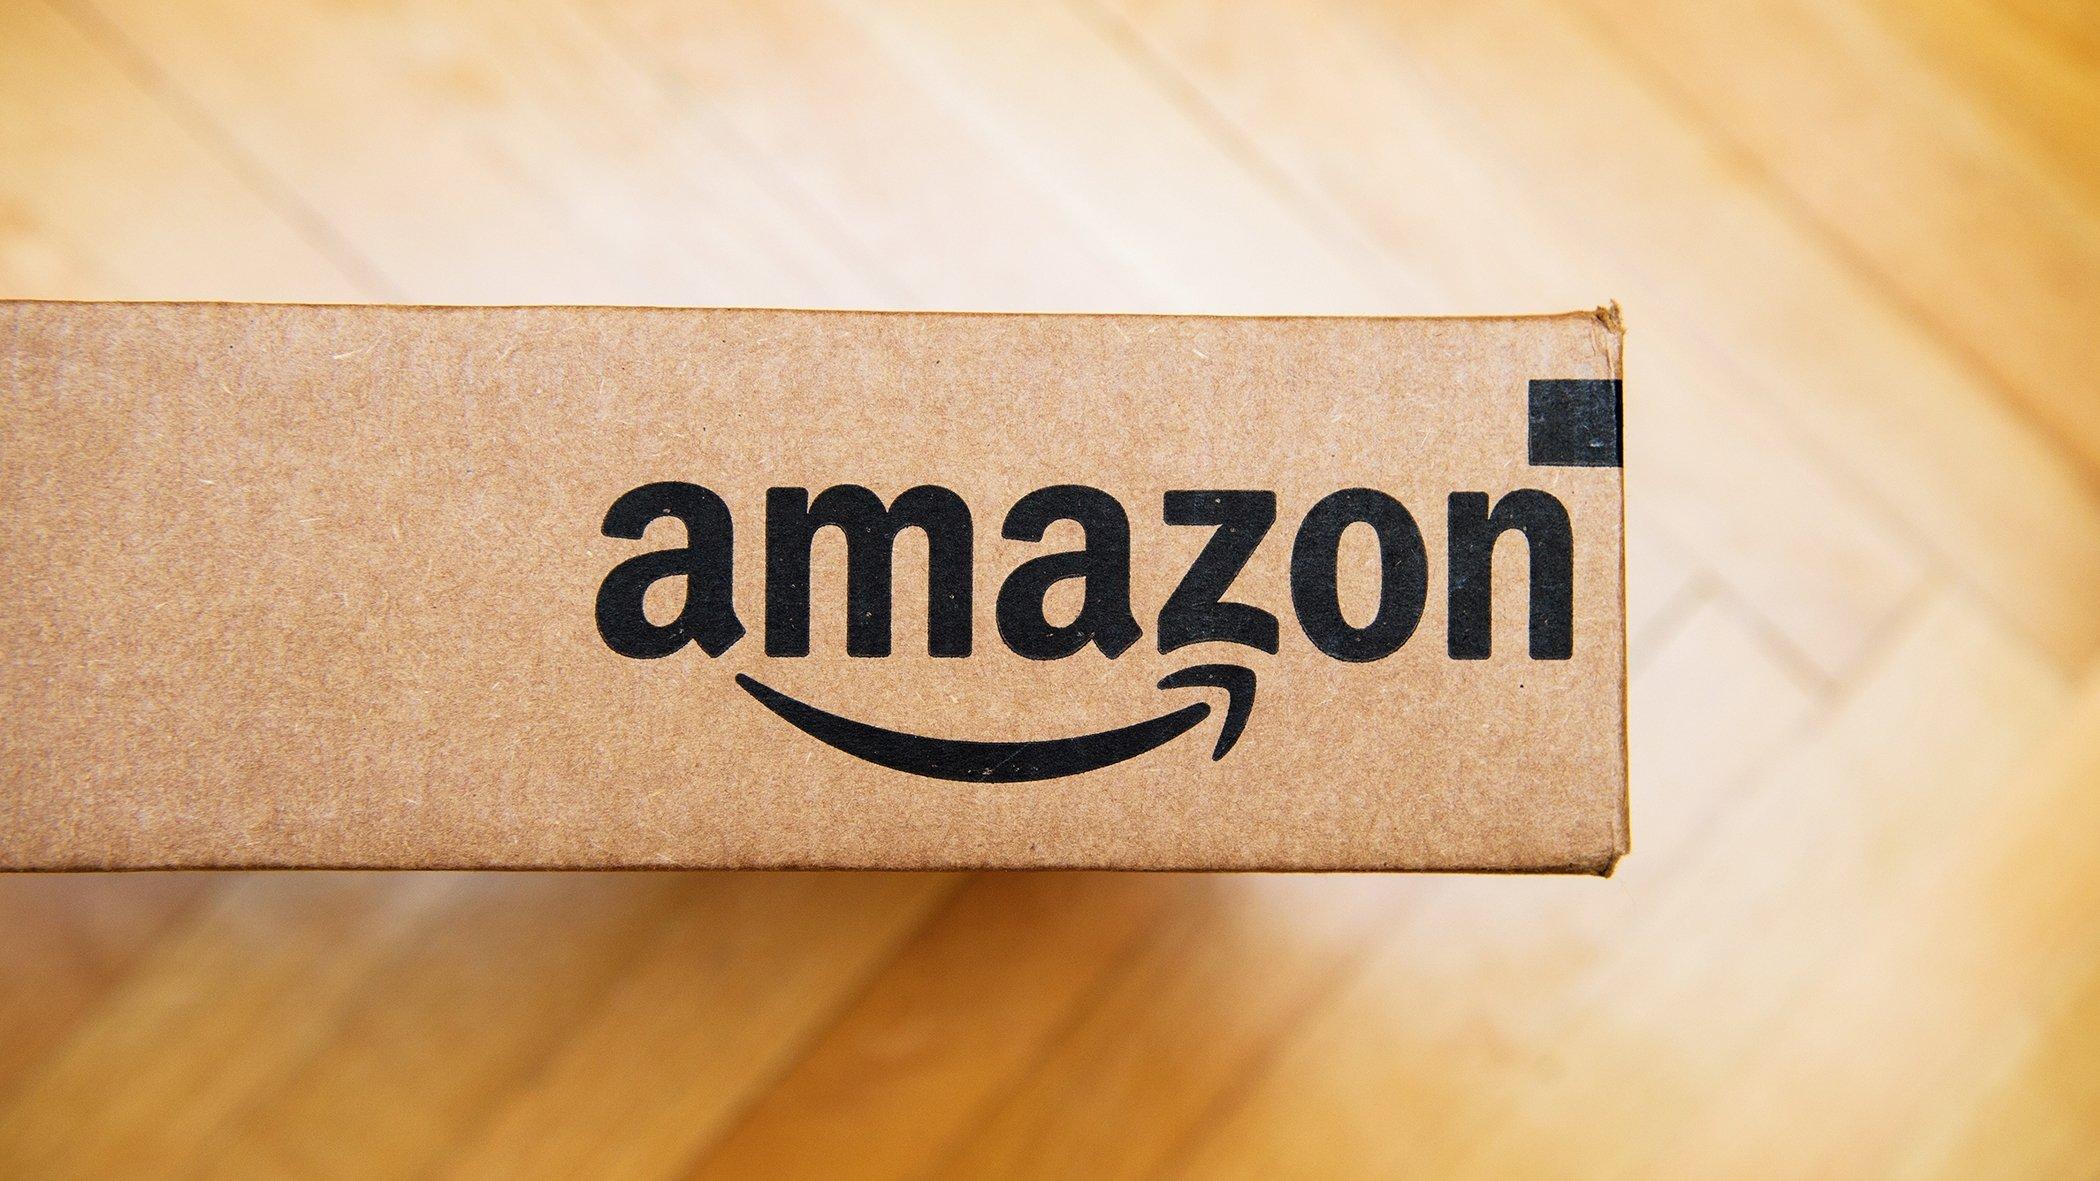 amazon logo on box on wood floor